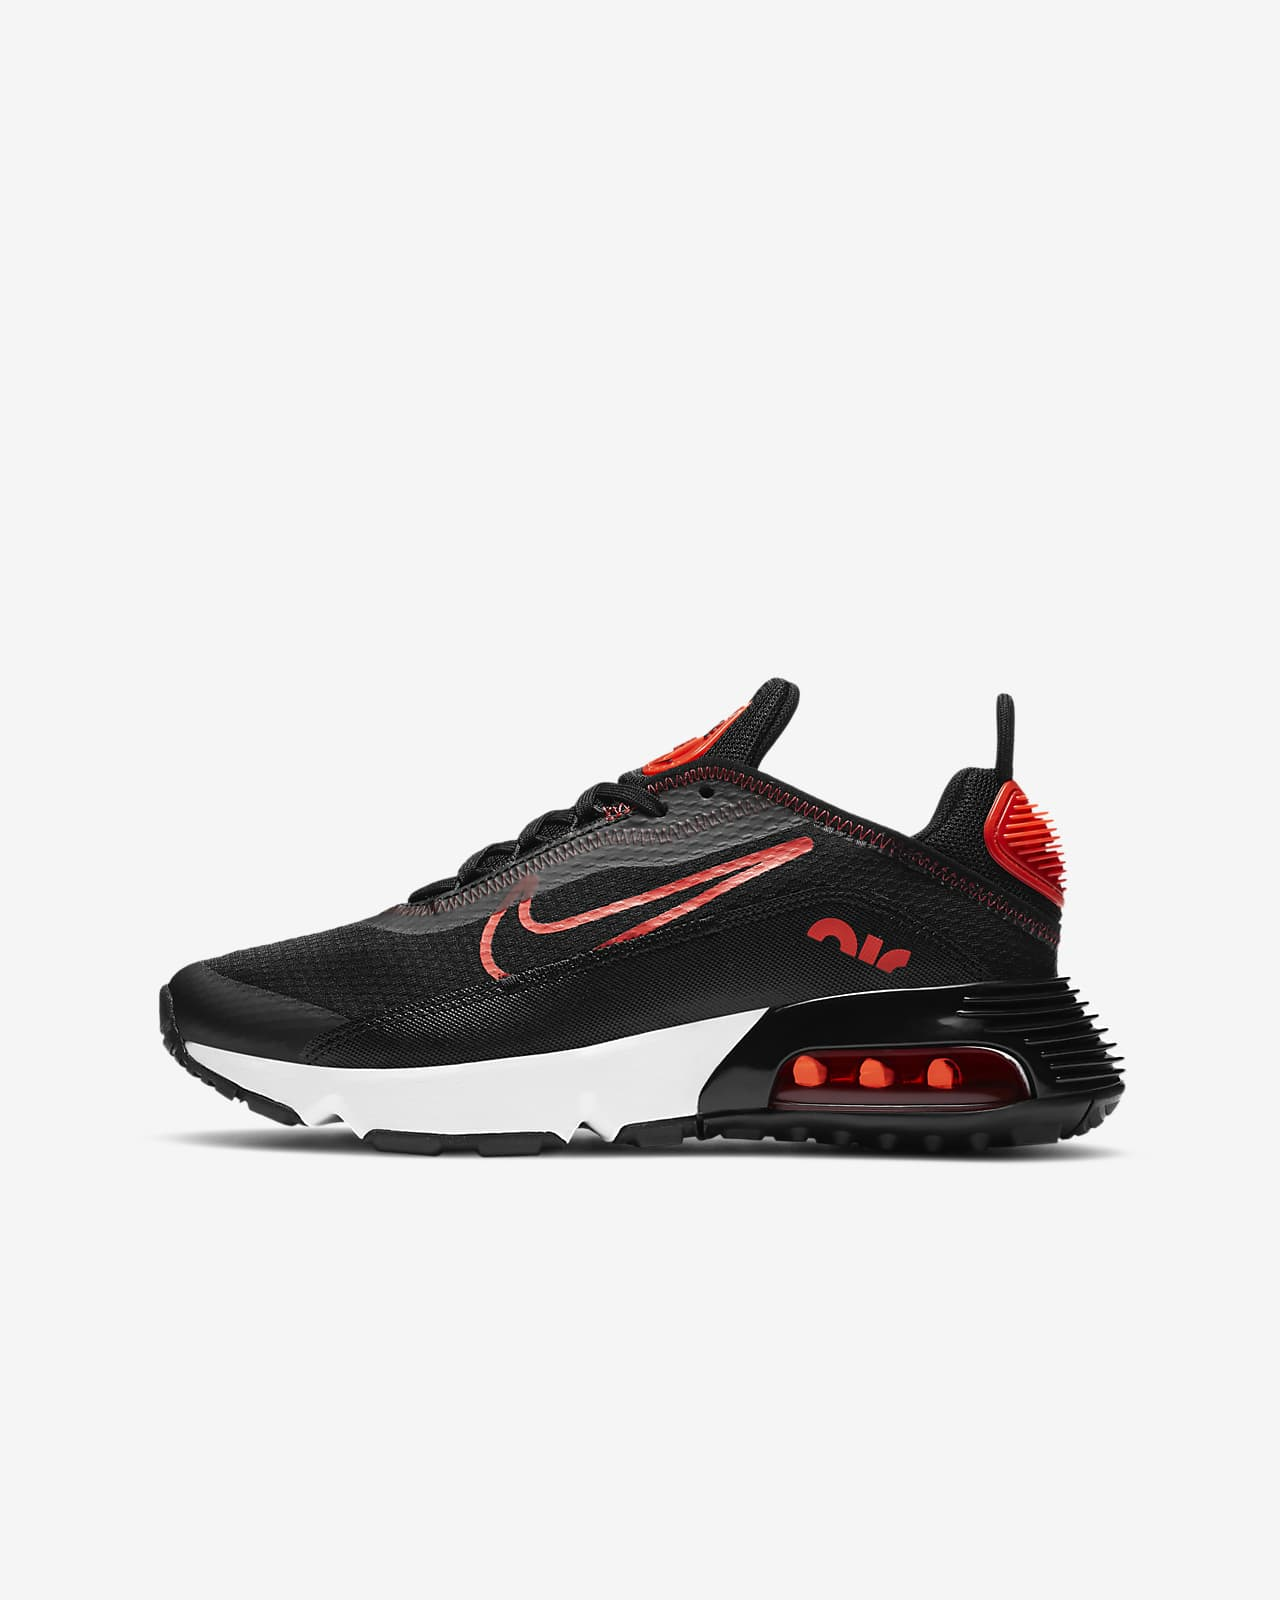 Sko Nike Air Max 2090 för ungdom